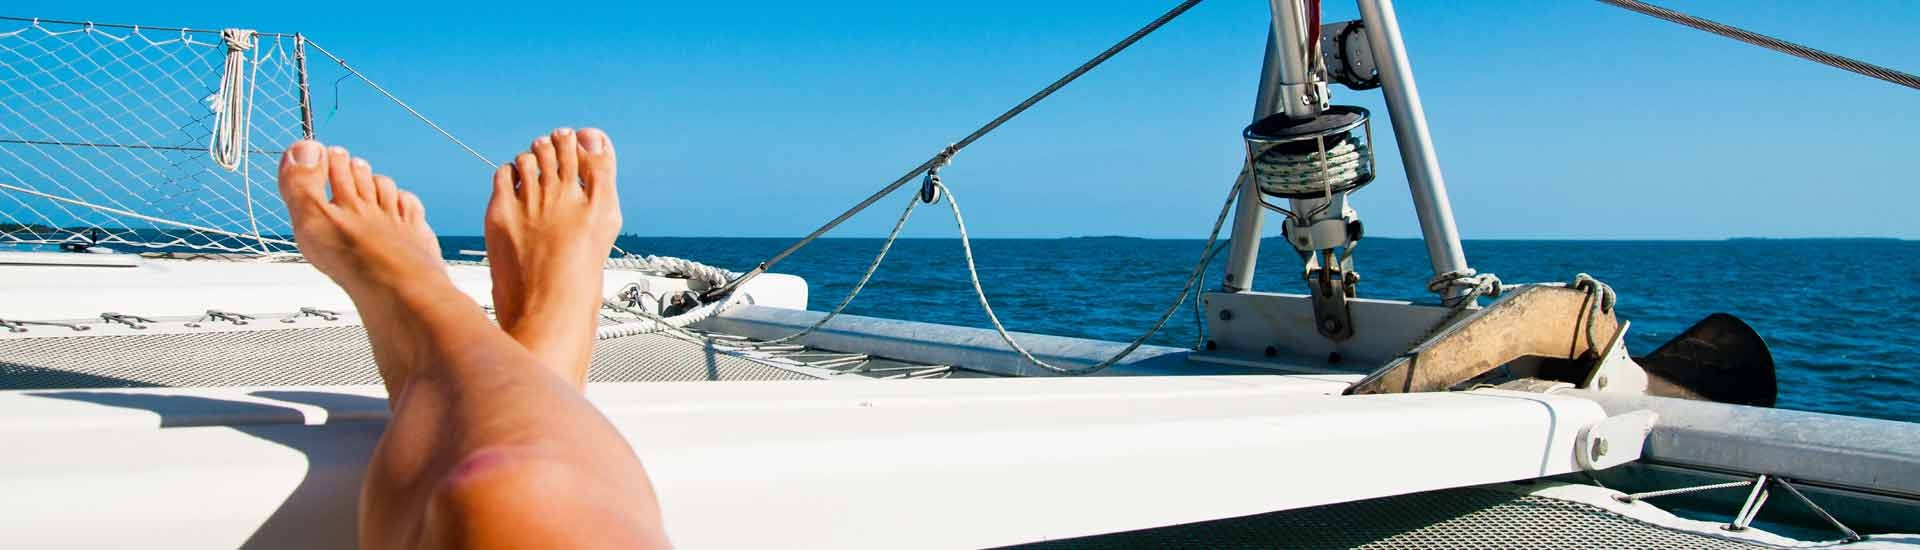 Catamaran Net